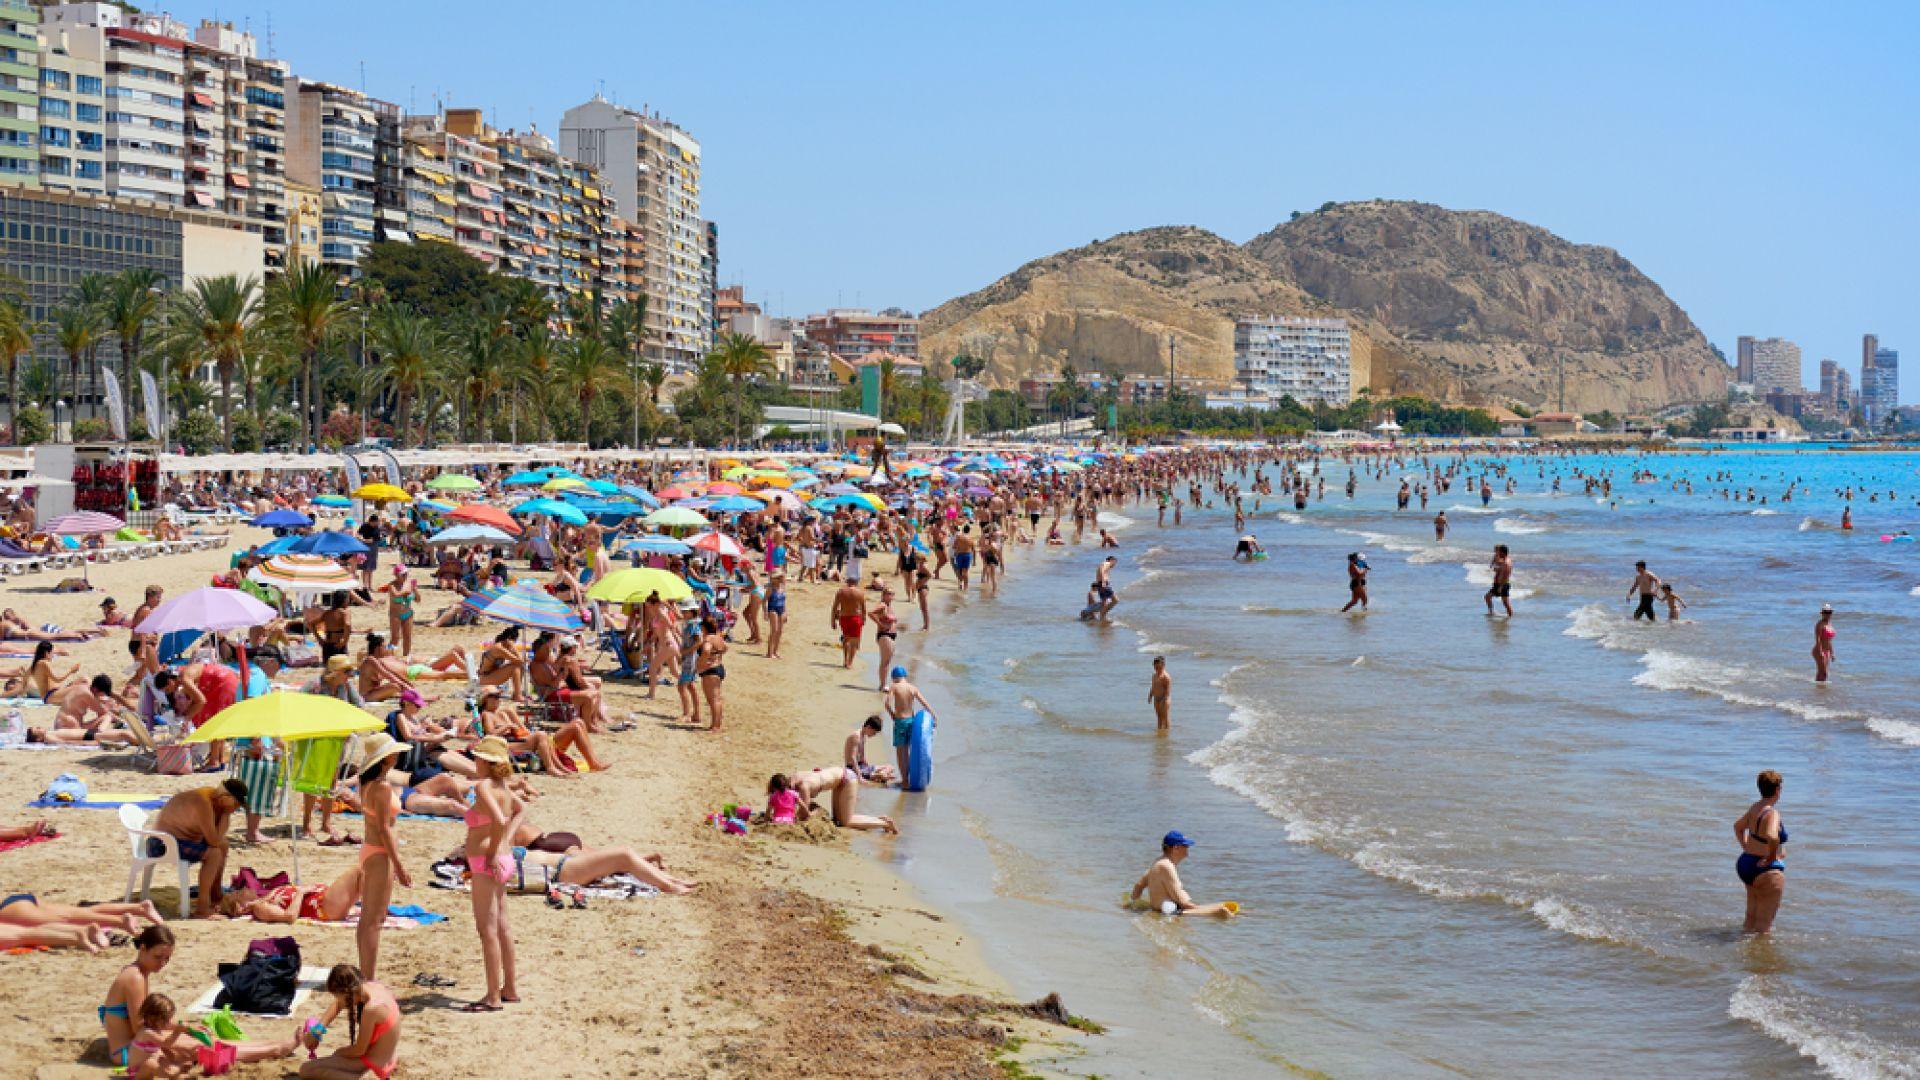 Незапомнени жеги в Европа, падат температурни рекорди